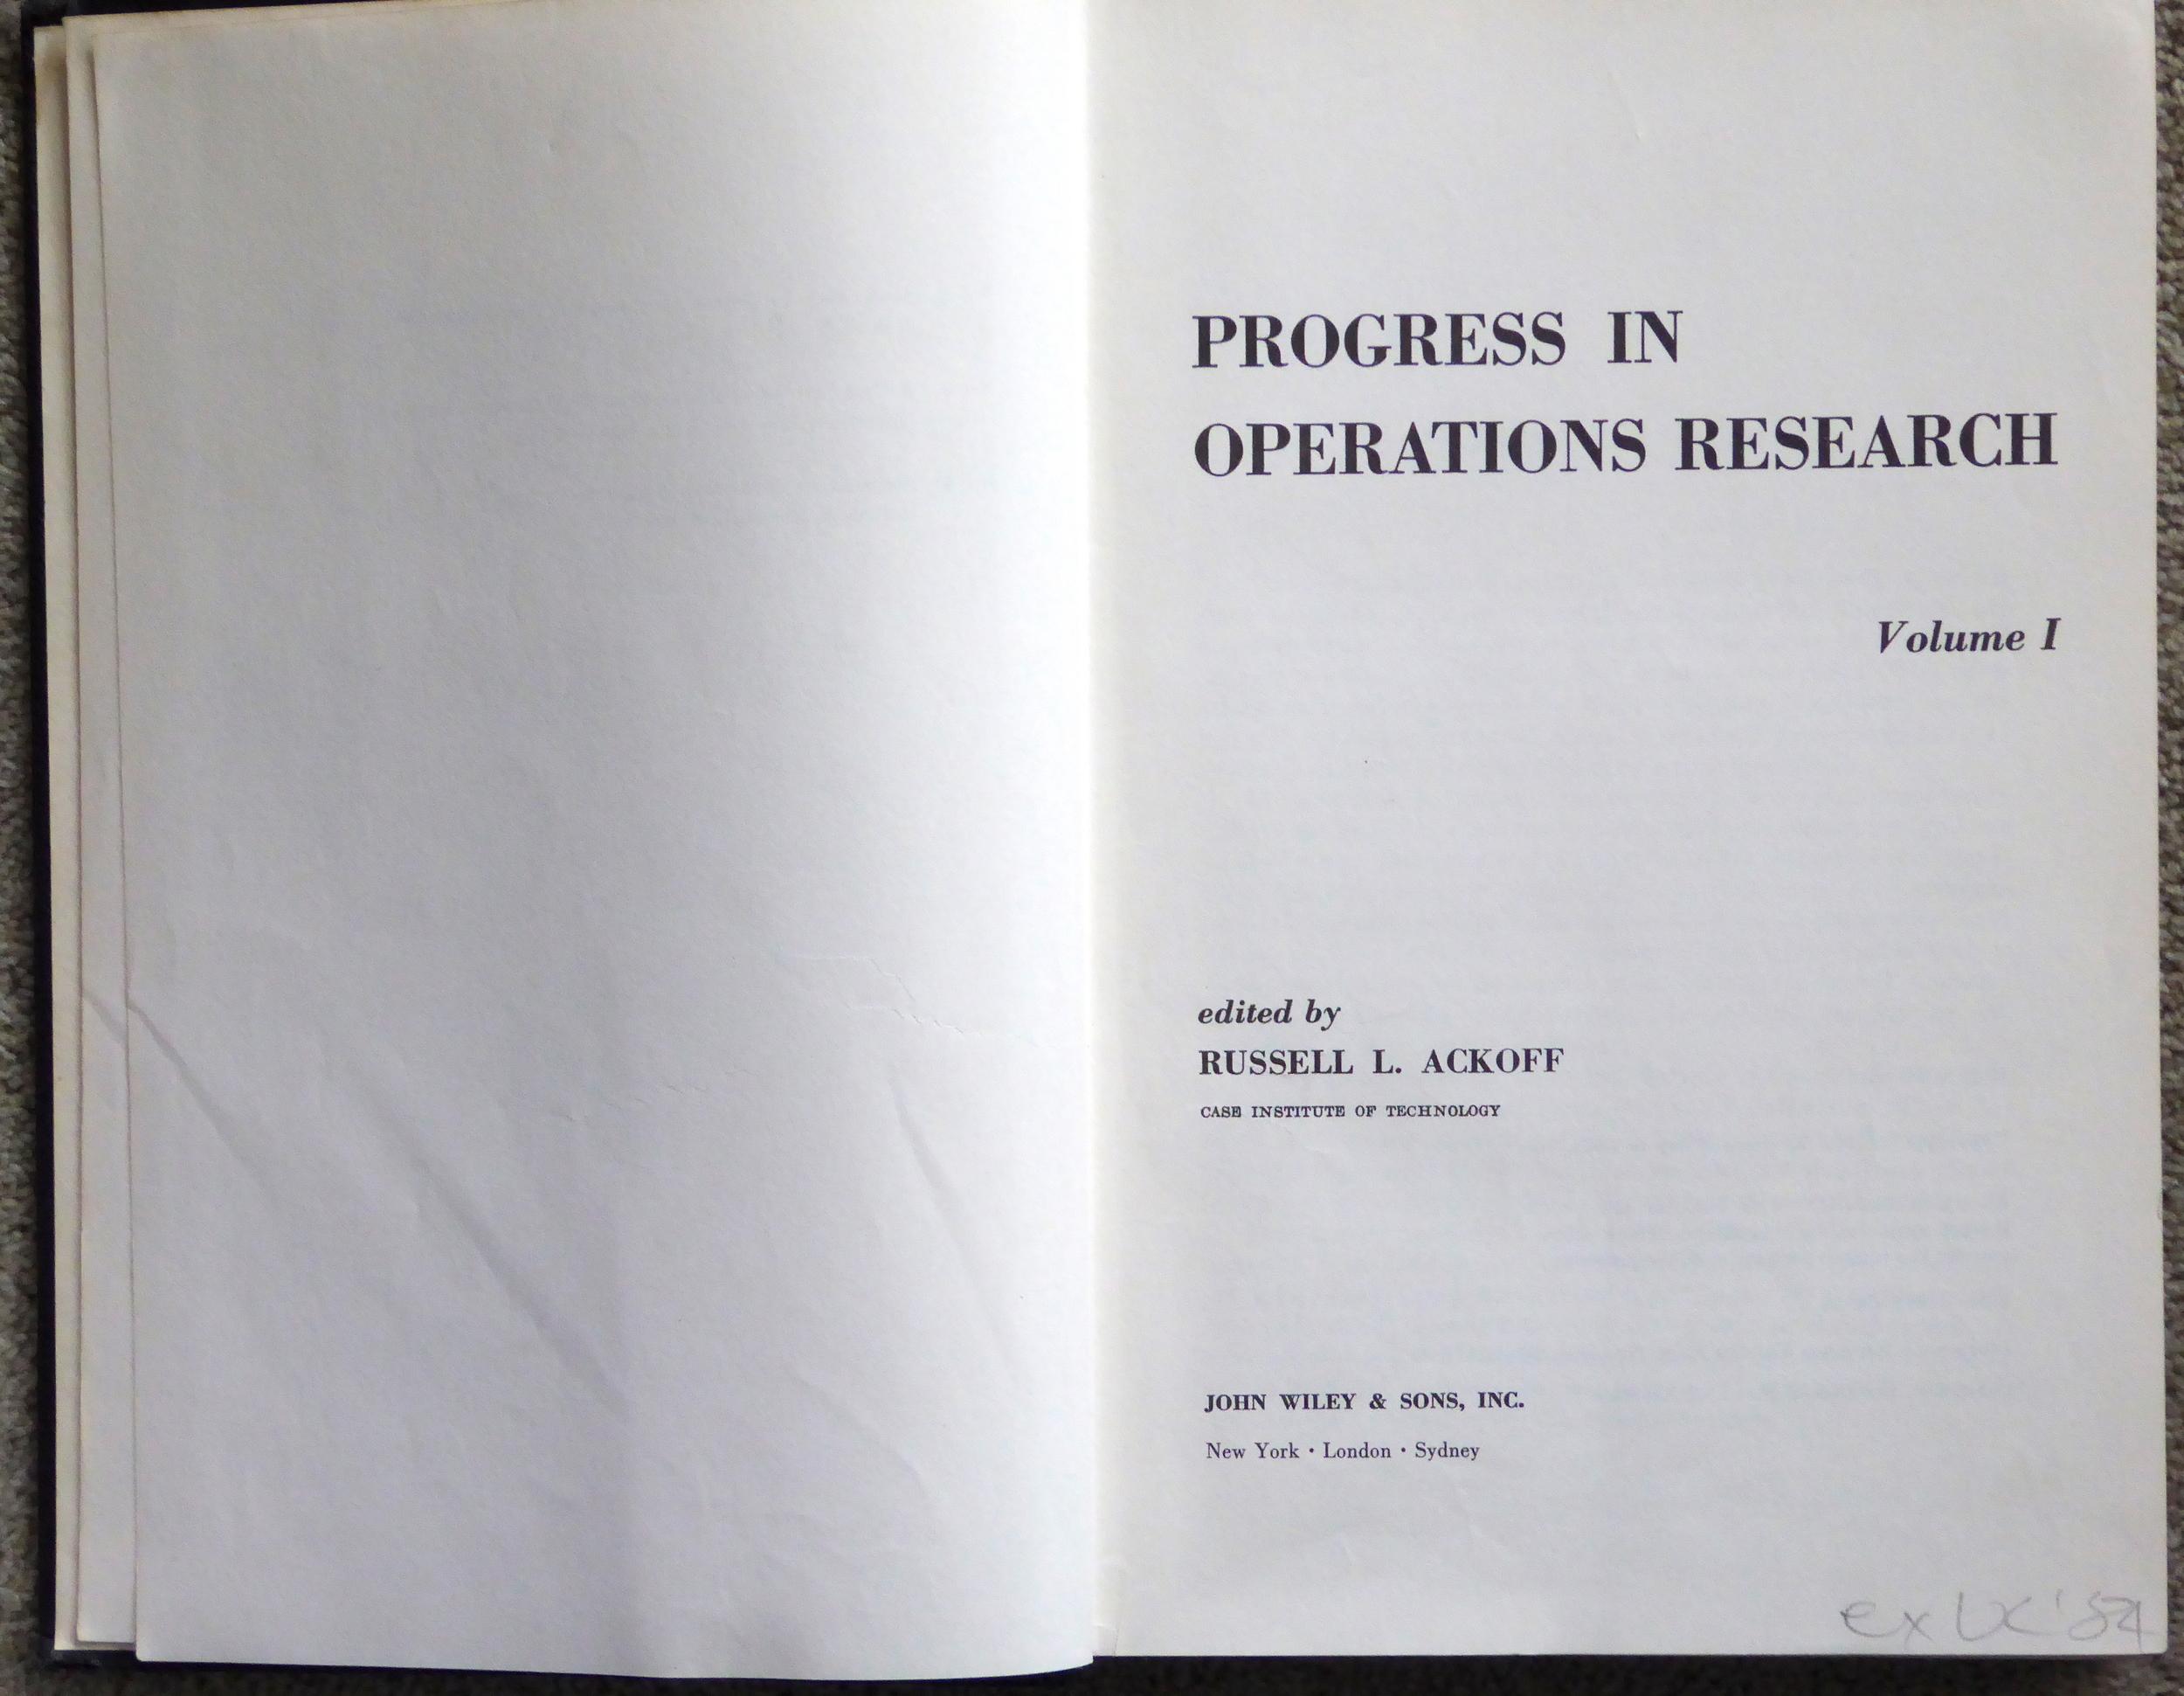 DDR_P1010056_Ackoff_ProgressOperationsResearch.JPG